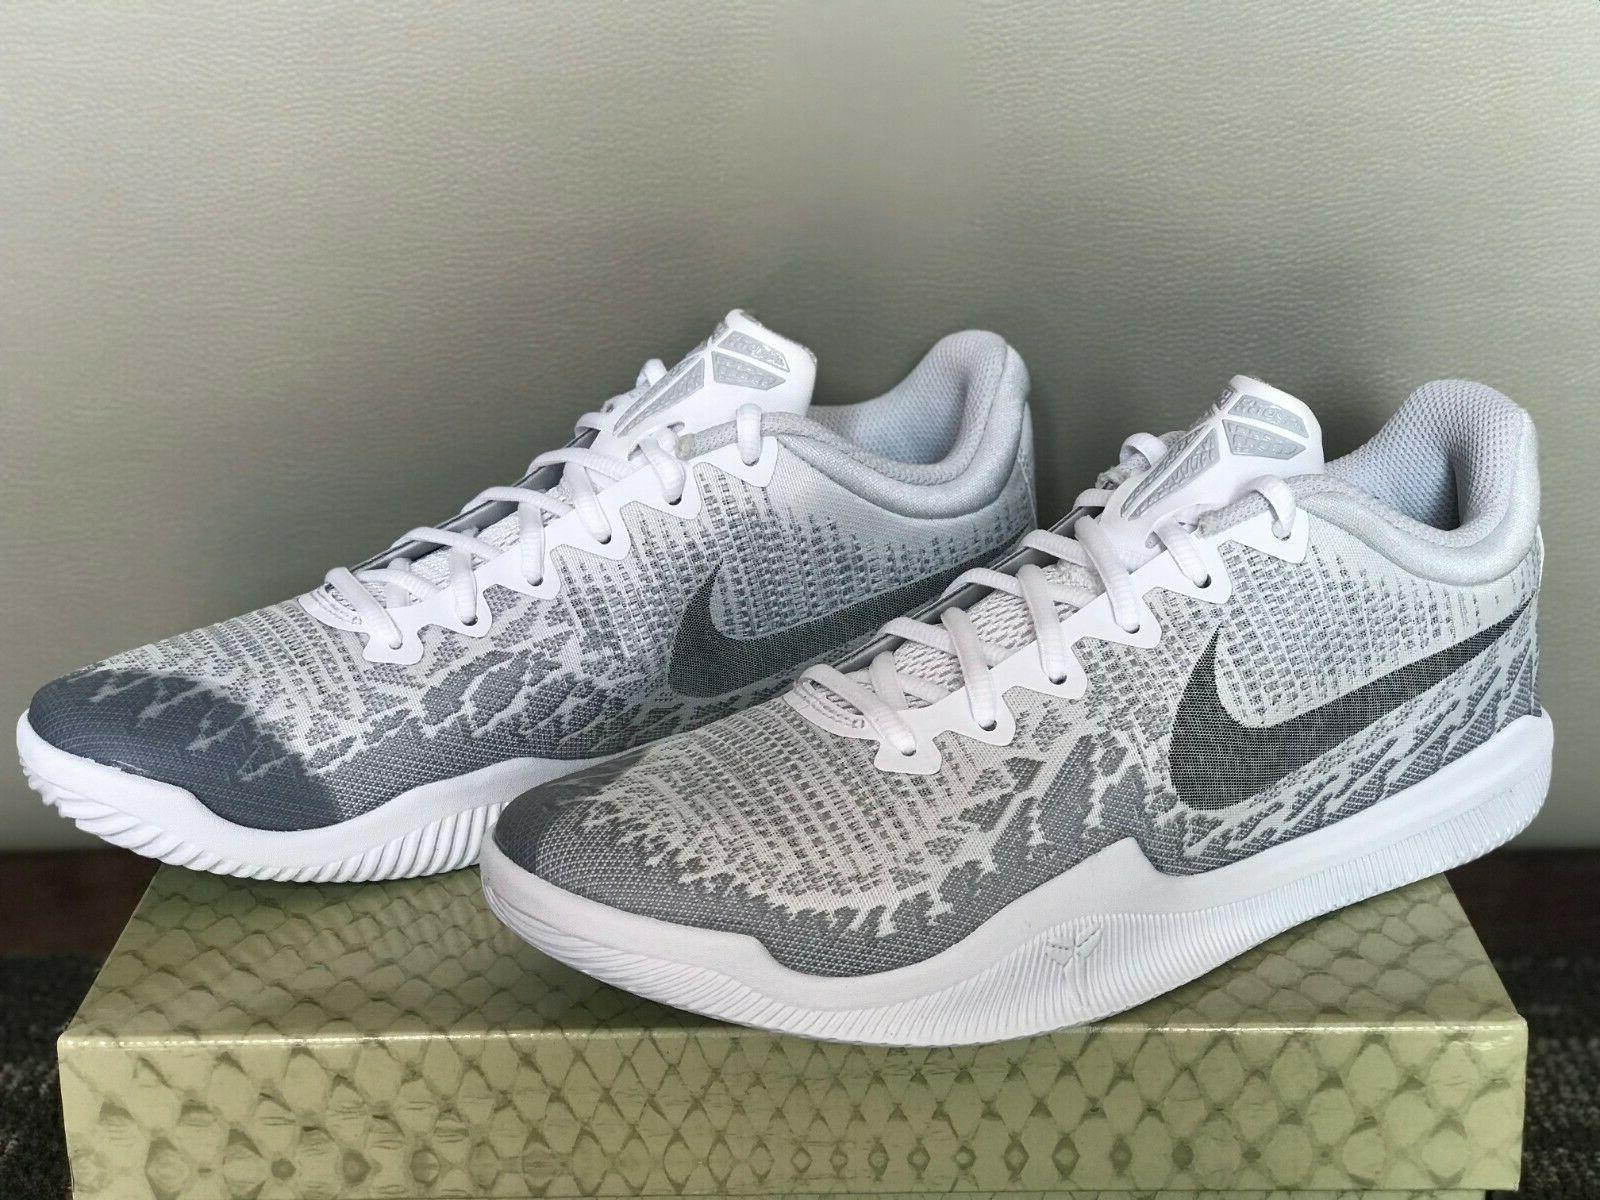 New Nike Kobe Rage Low 908972 100 XI Elite